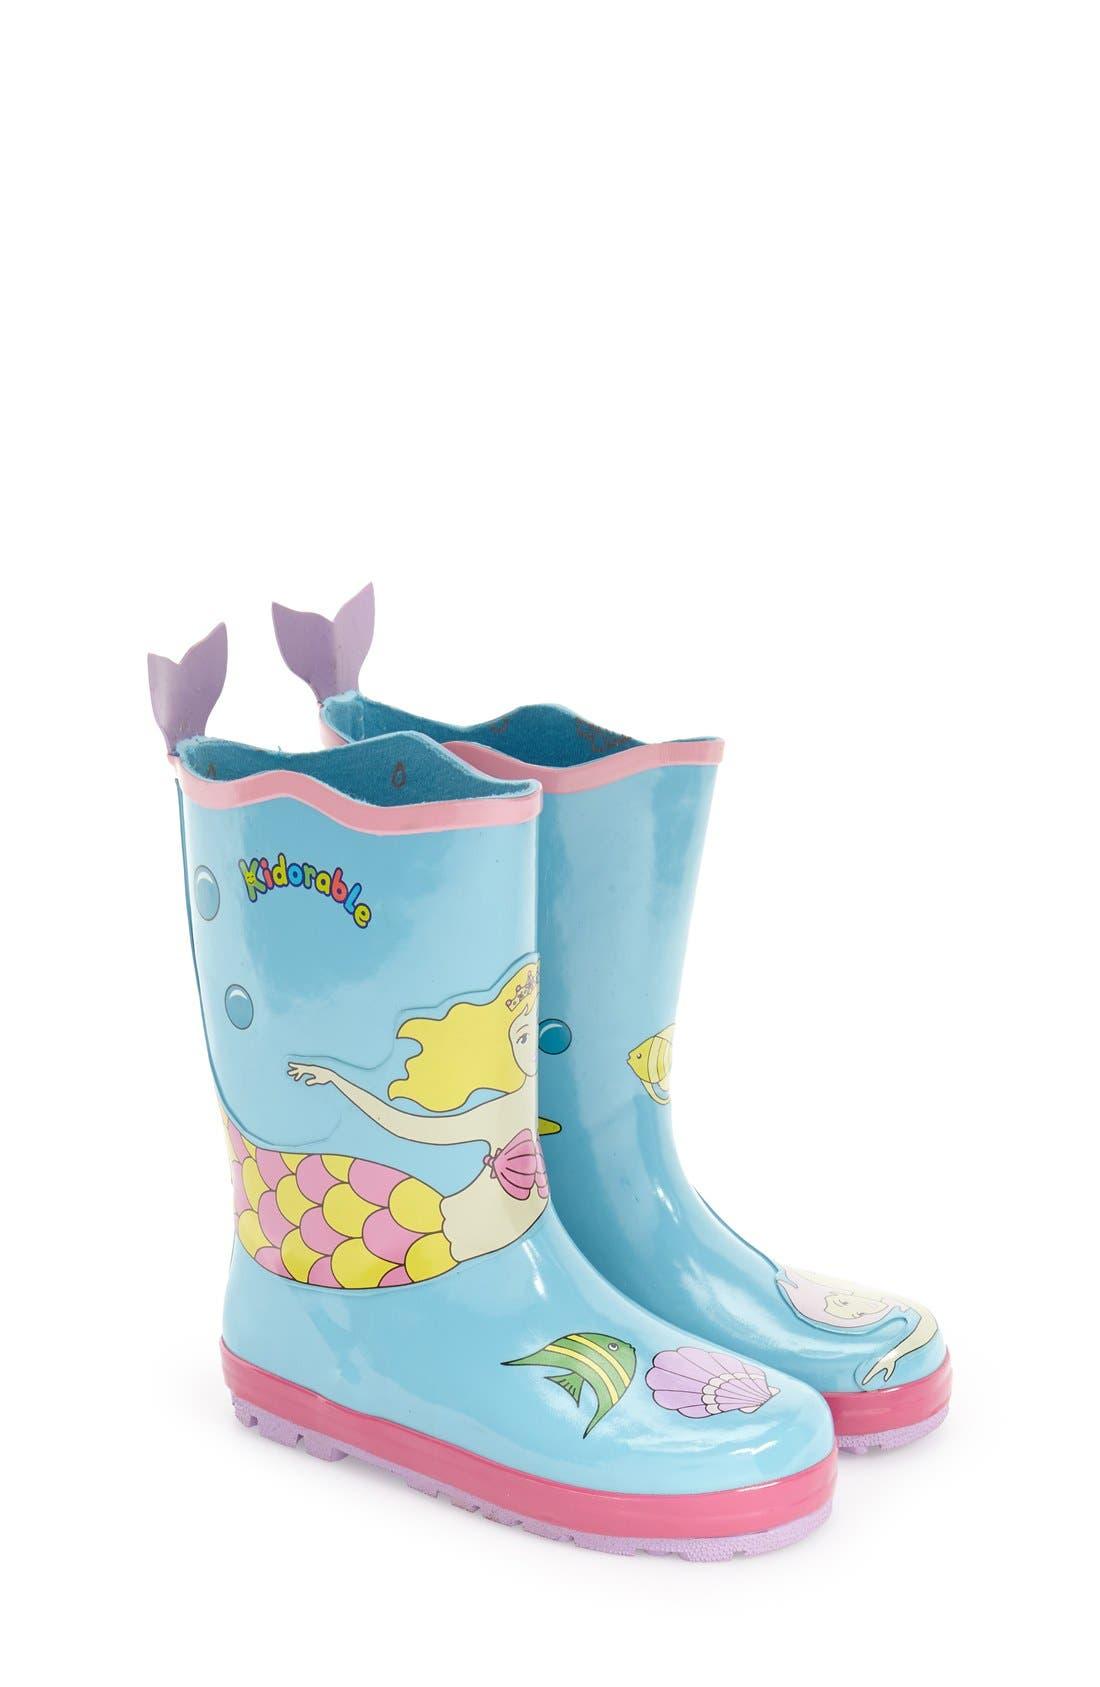 'Mermaid' Waterproof Rain Boot,                             Main thumbnail 1, color,                             400